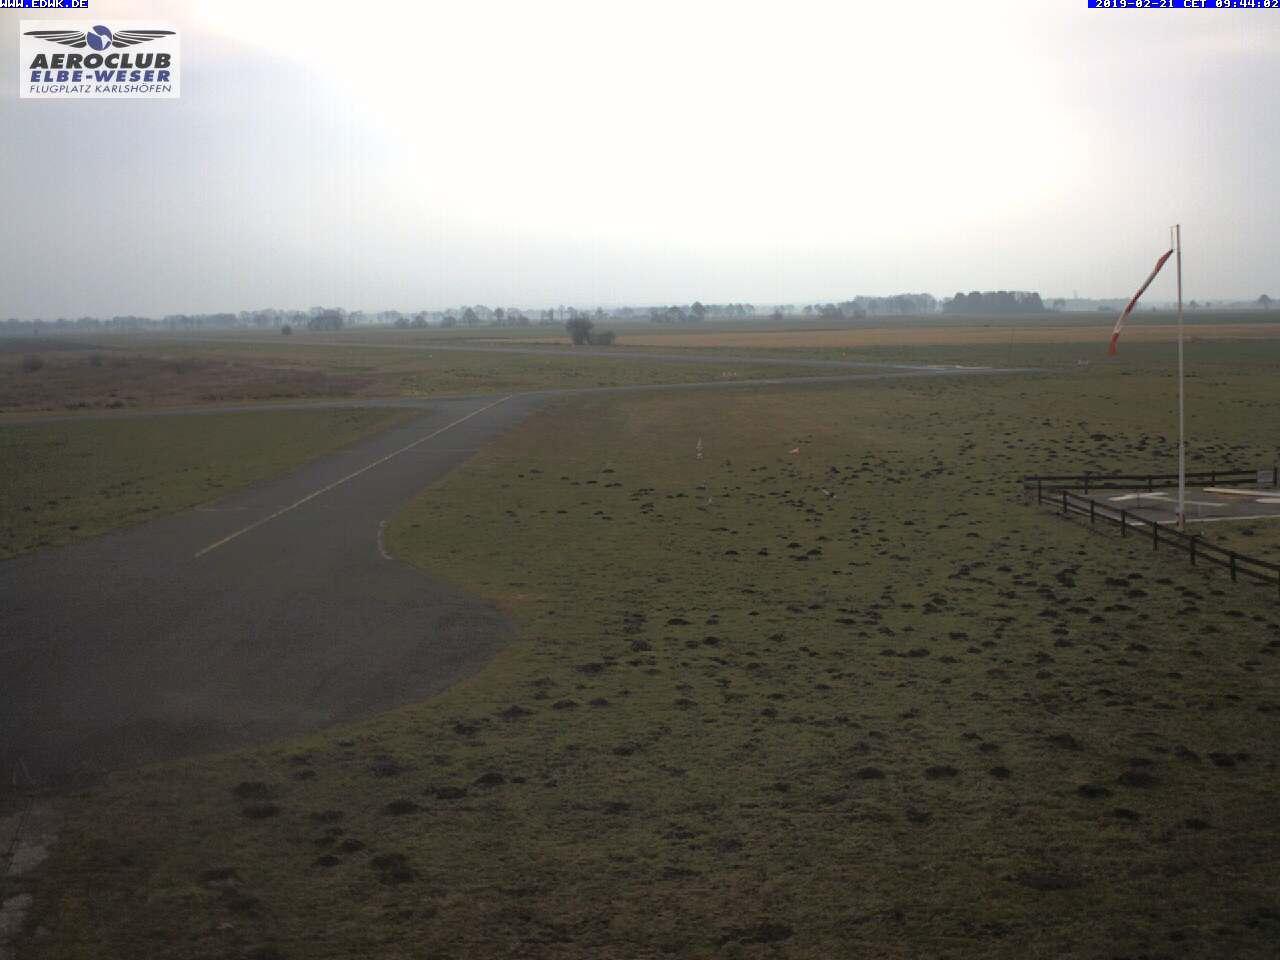 Webcam Flugplatz Karlshöfen (EDWK)